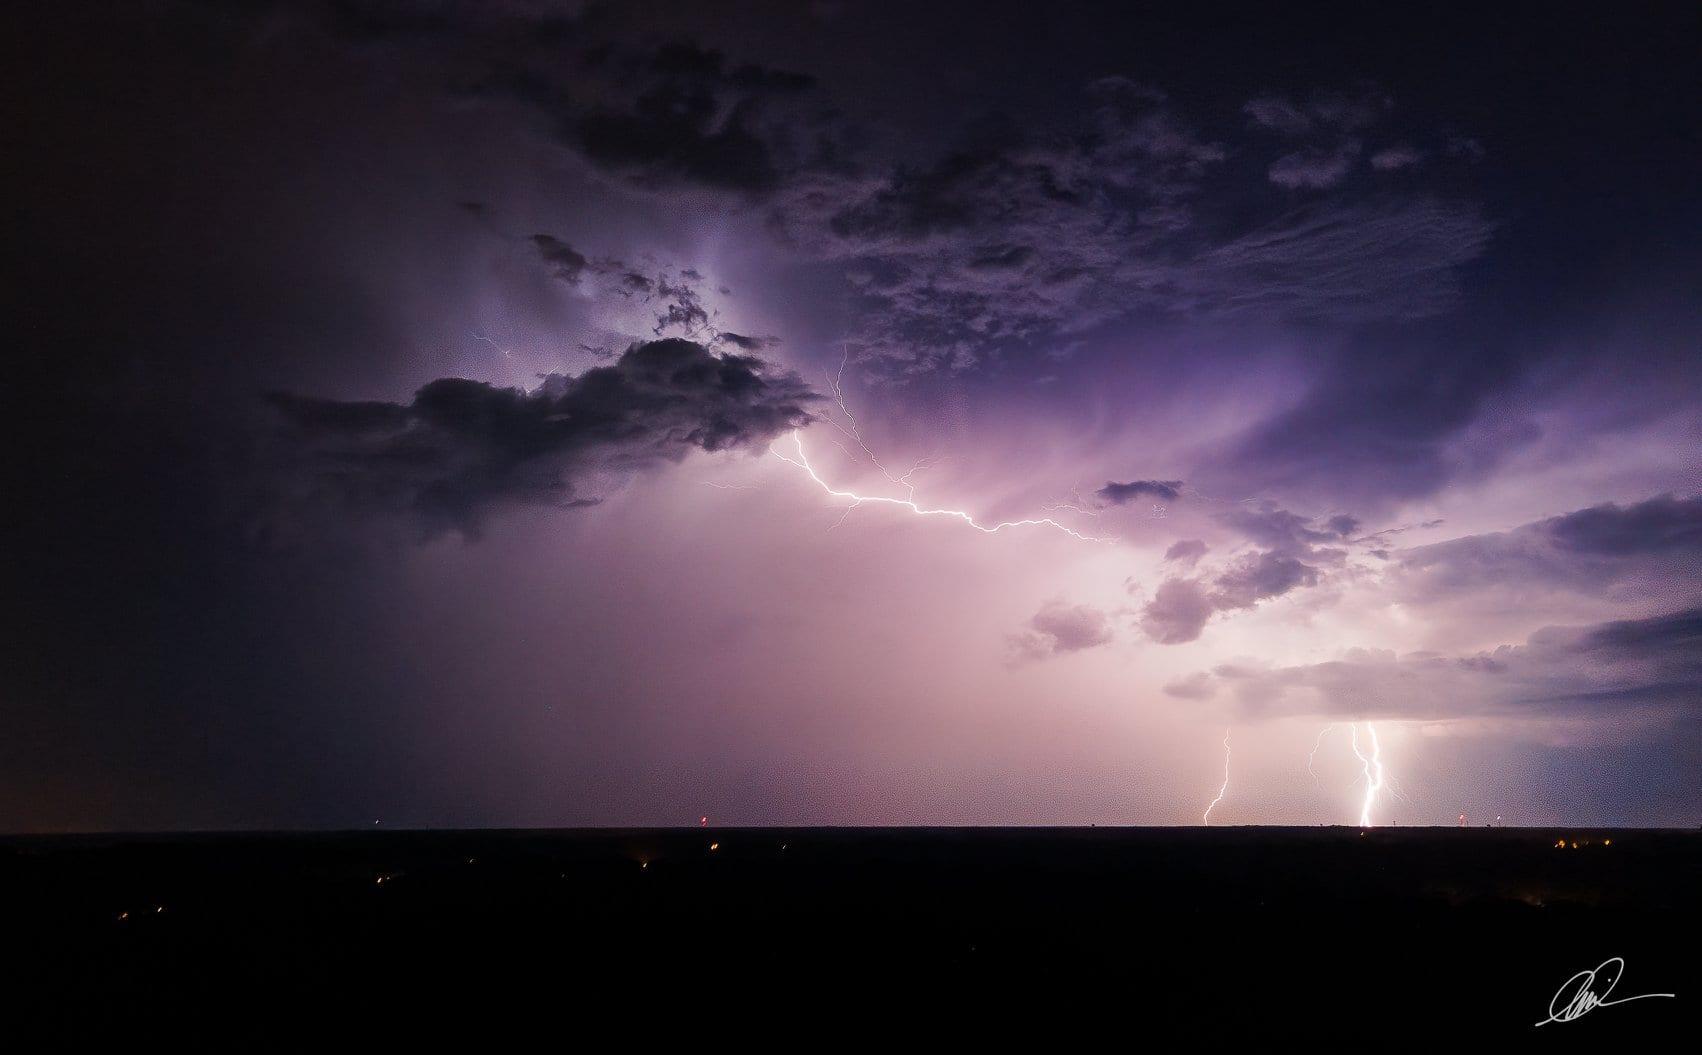 Mavic Air 2 captures lightning in long exposure aerial photos